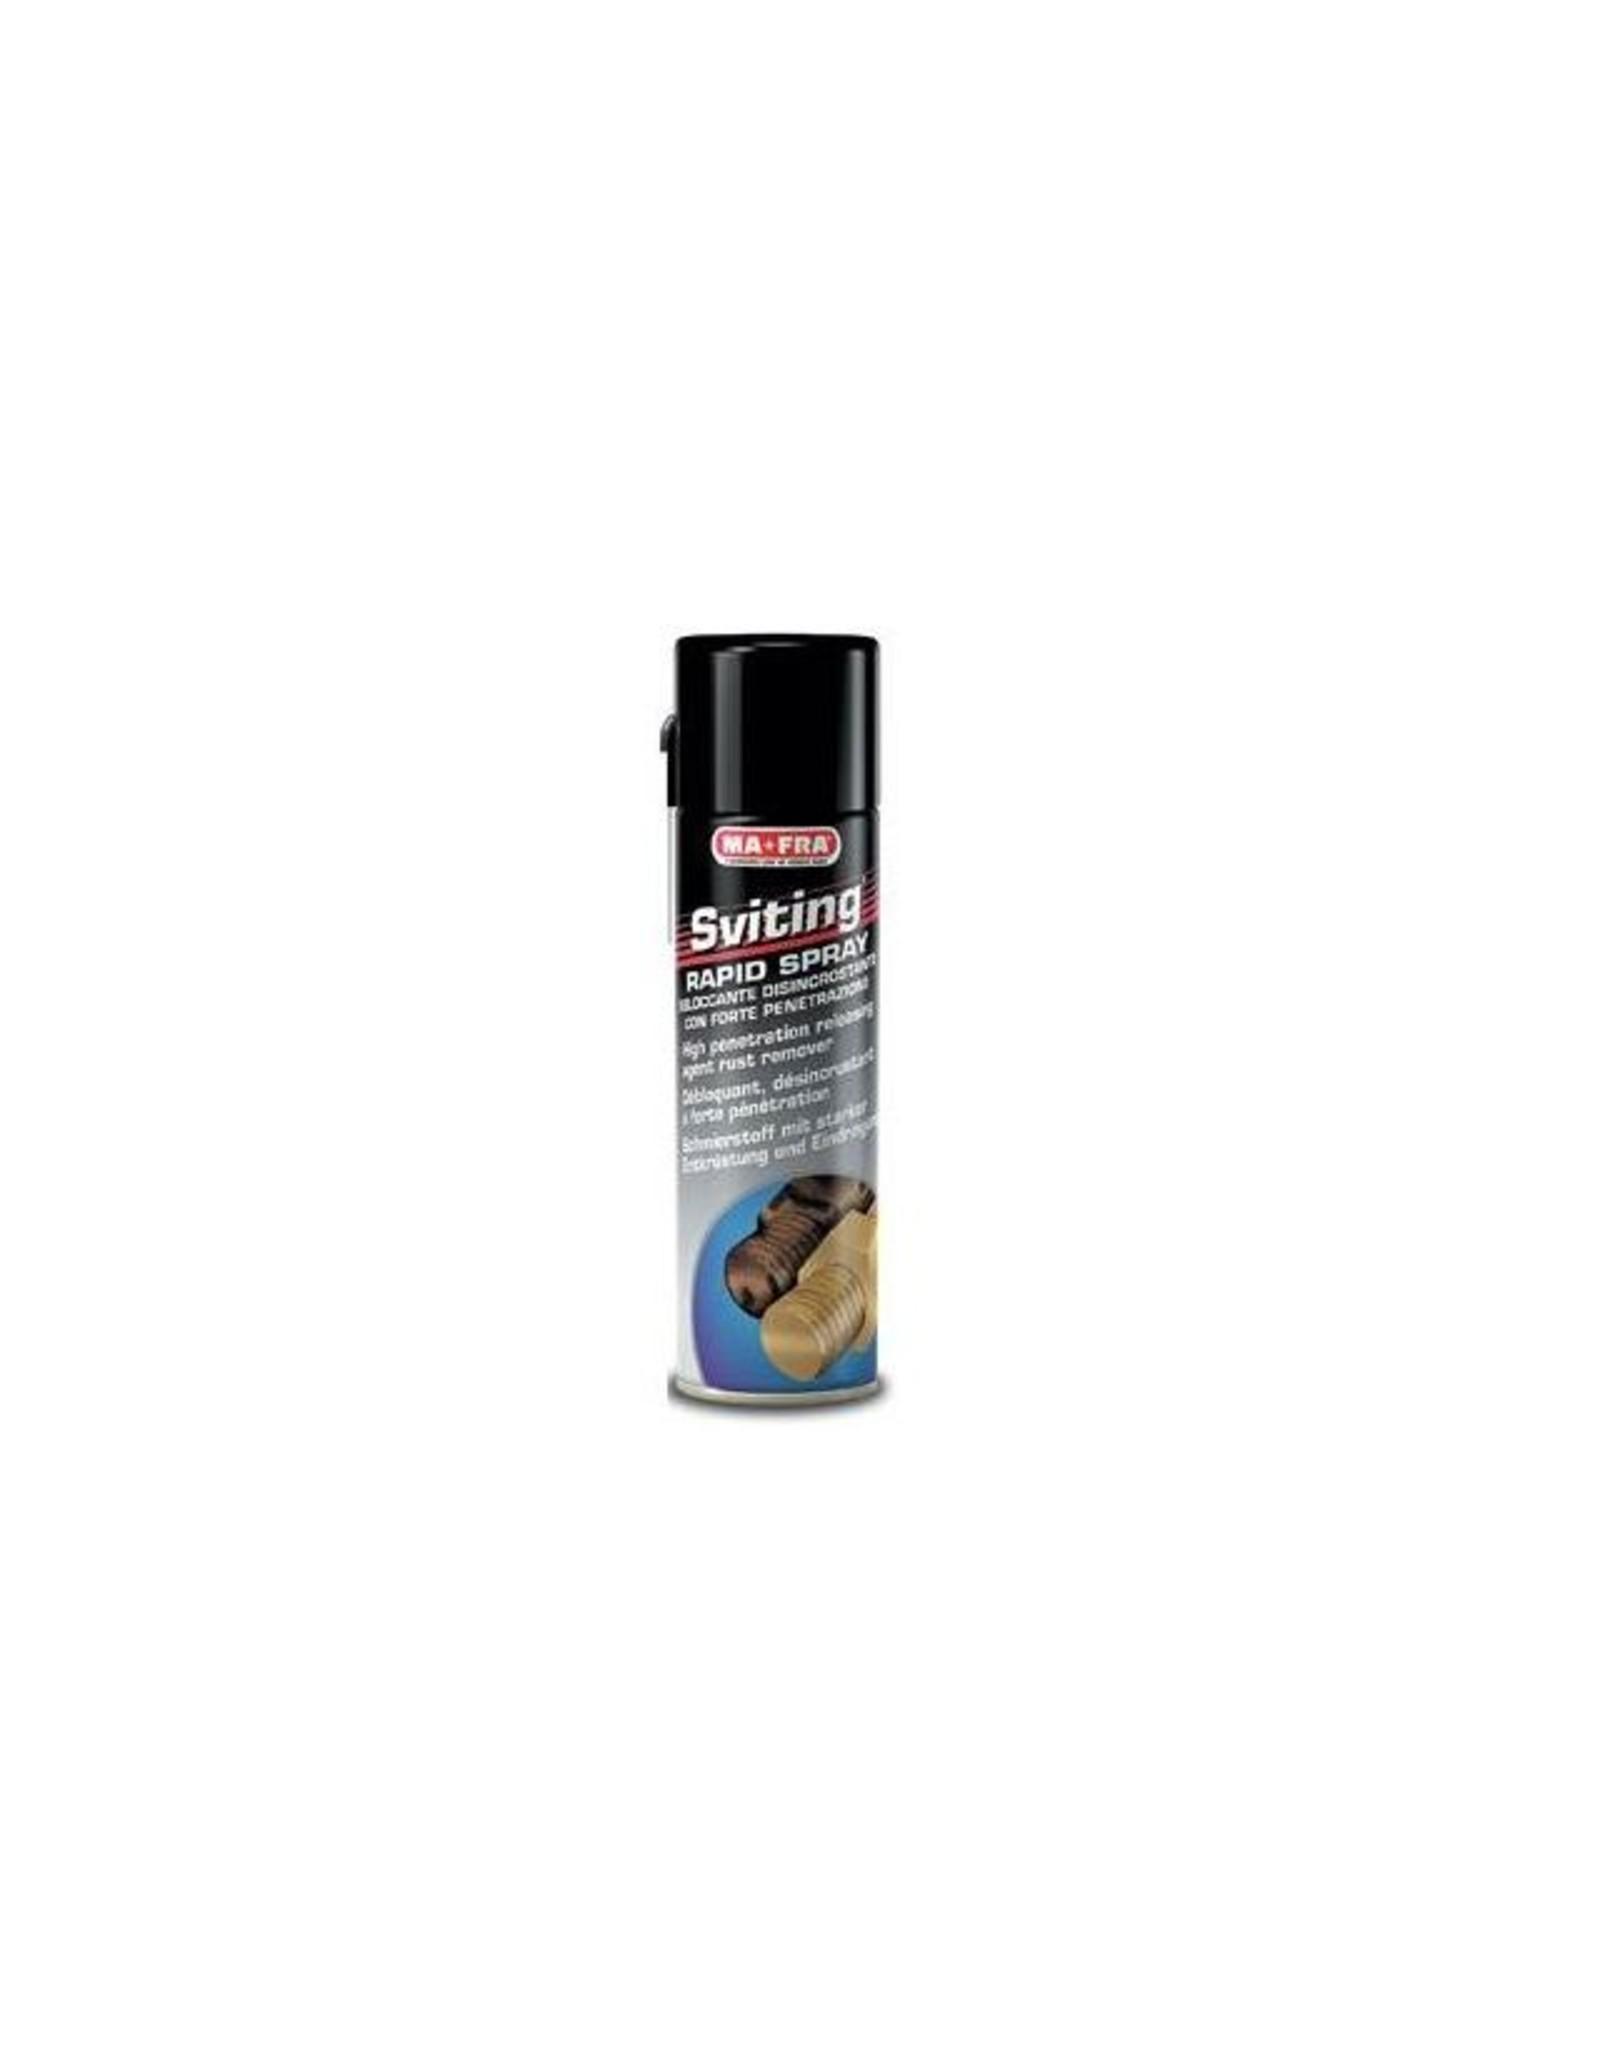 Mafra MaFra Sviting rapid spray krachtige kruipolie